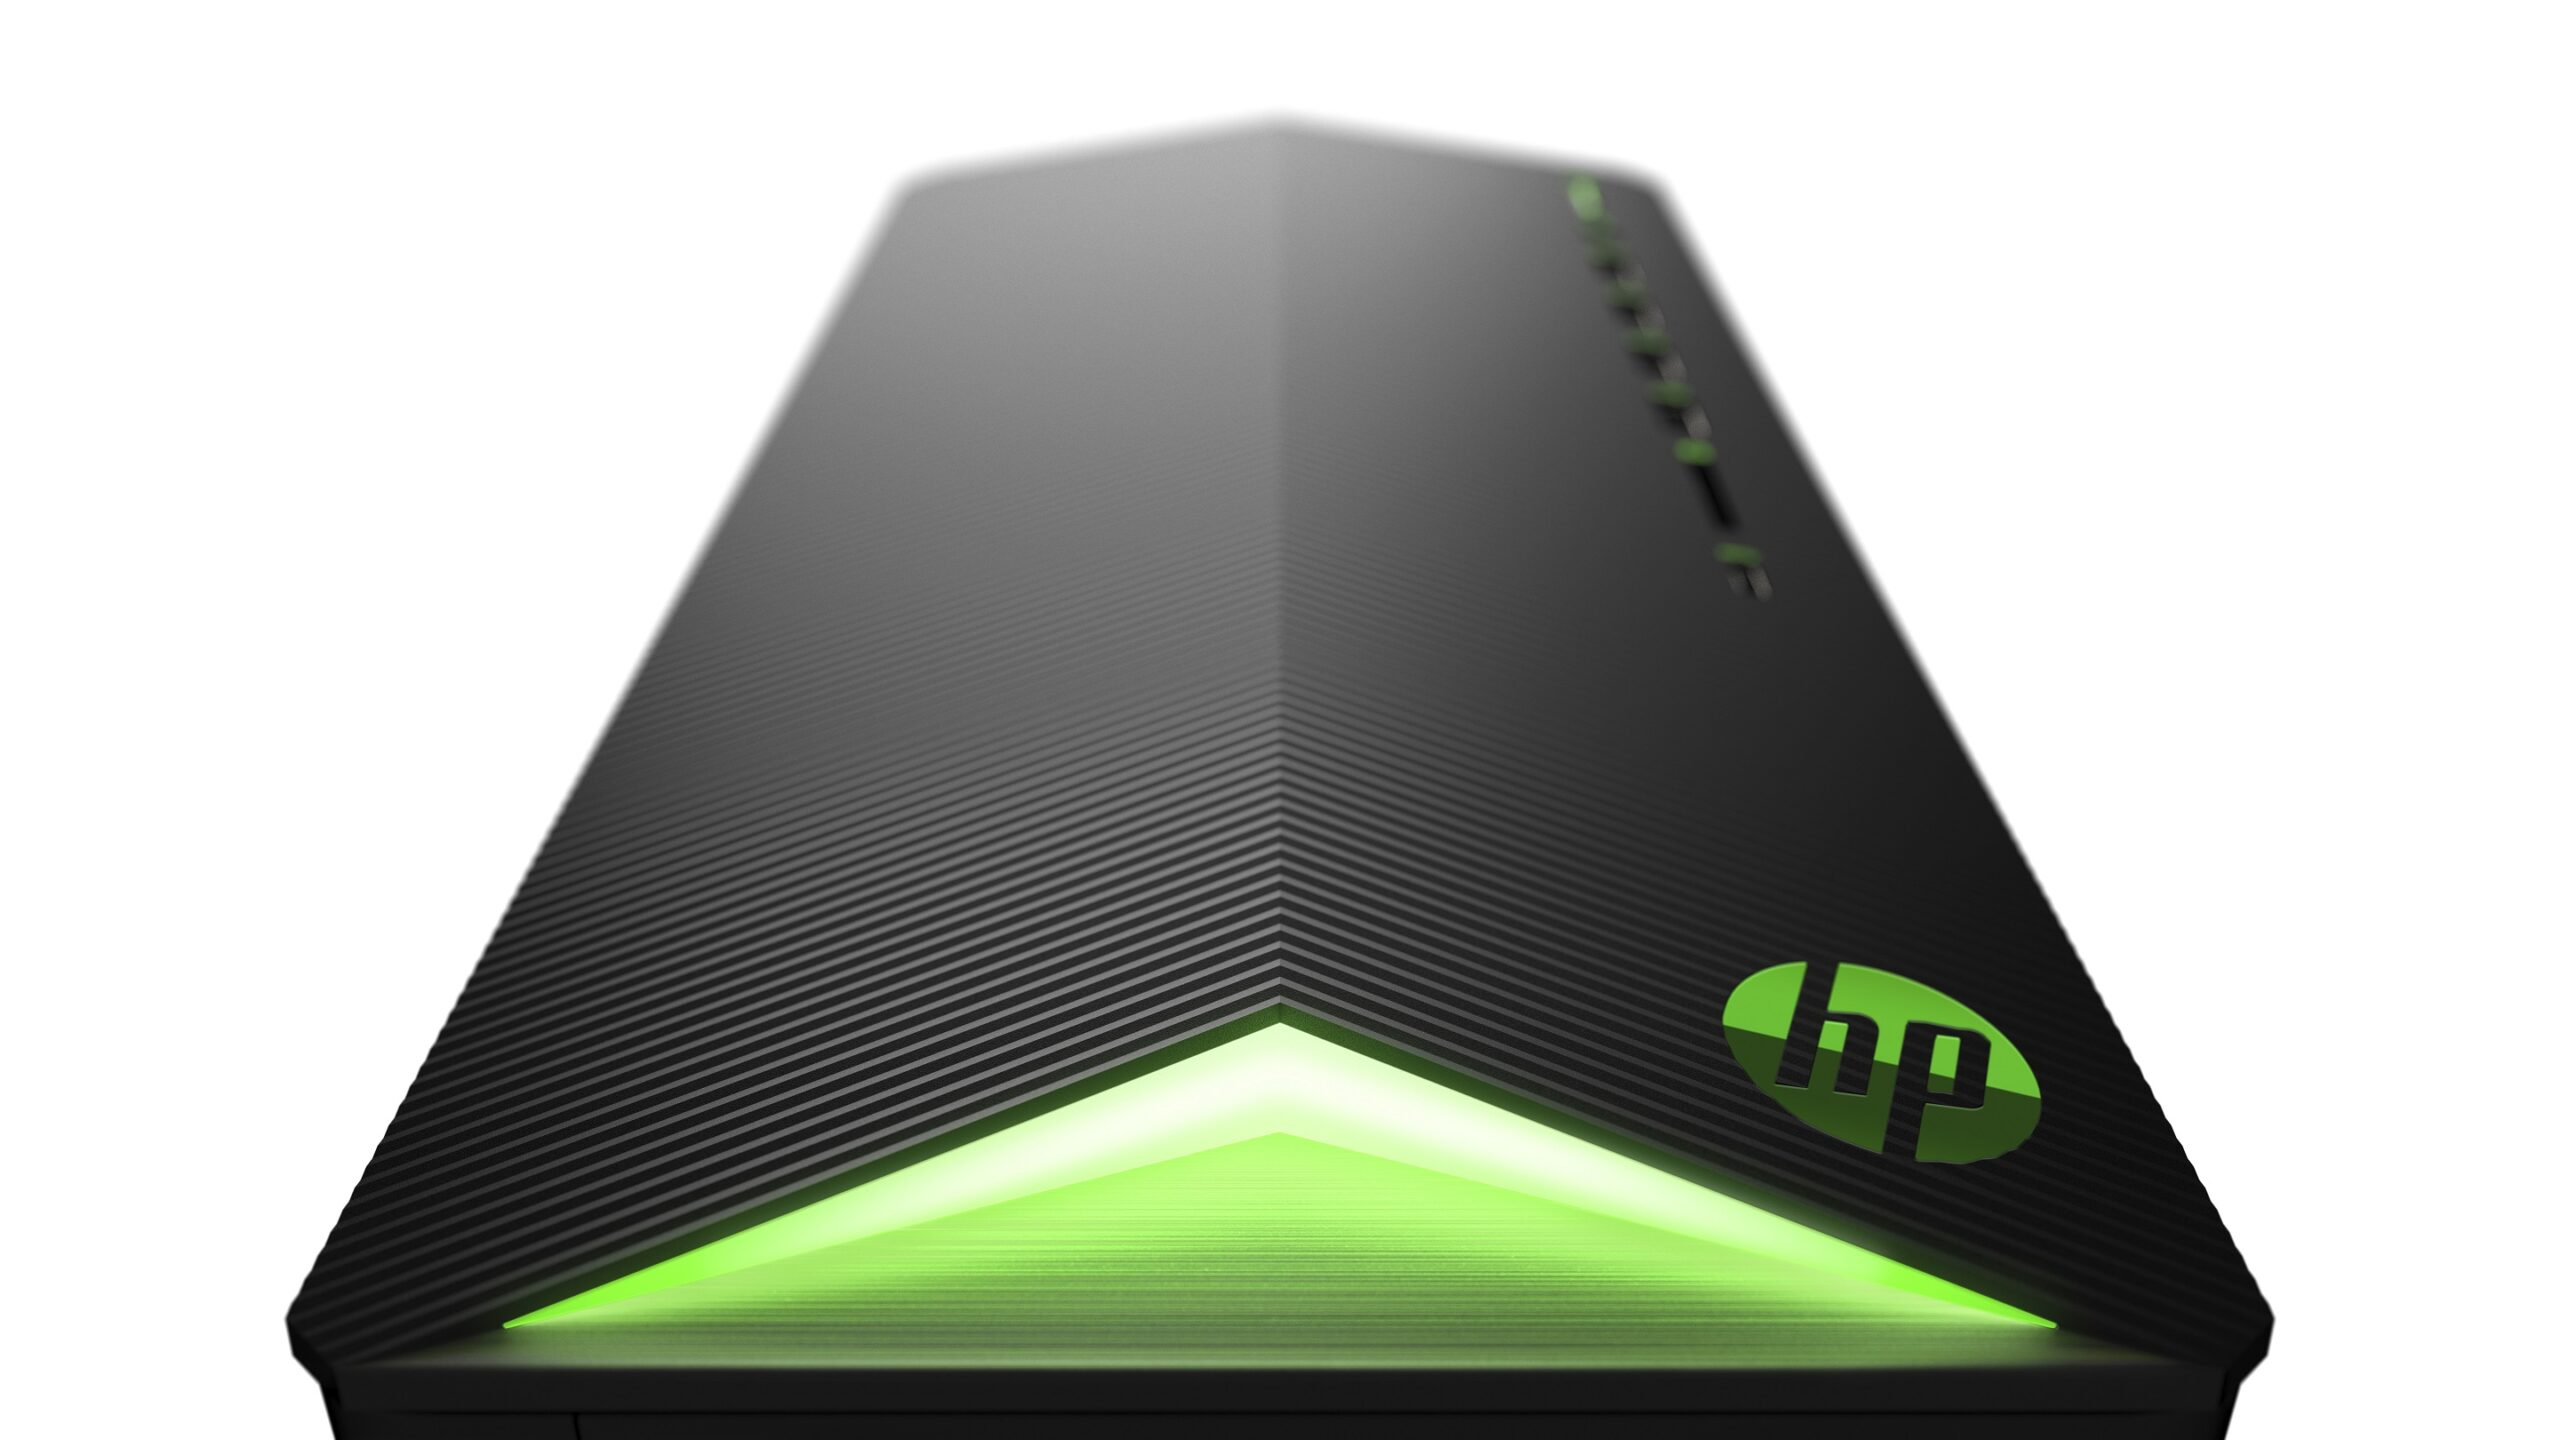 دسکتاپ HP مدل Pavilion Gaming TG01 B